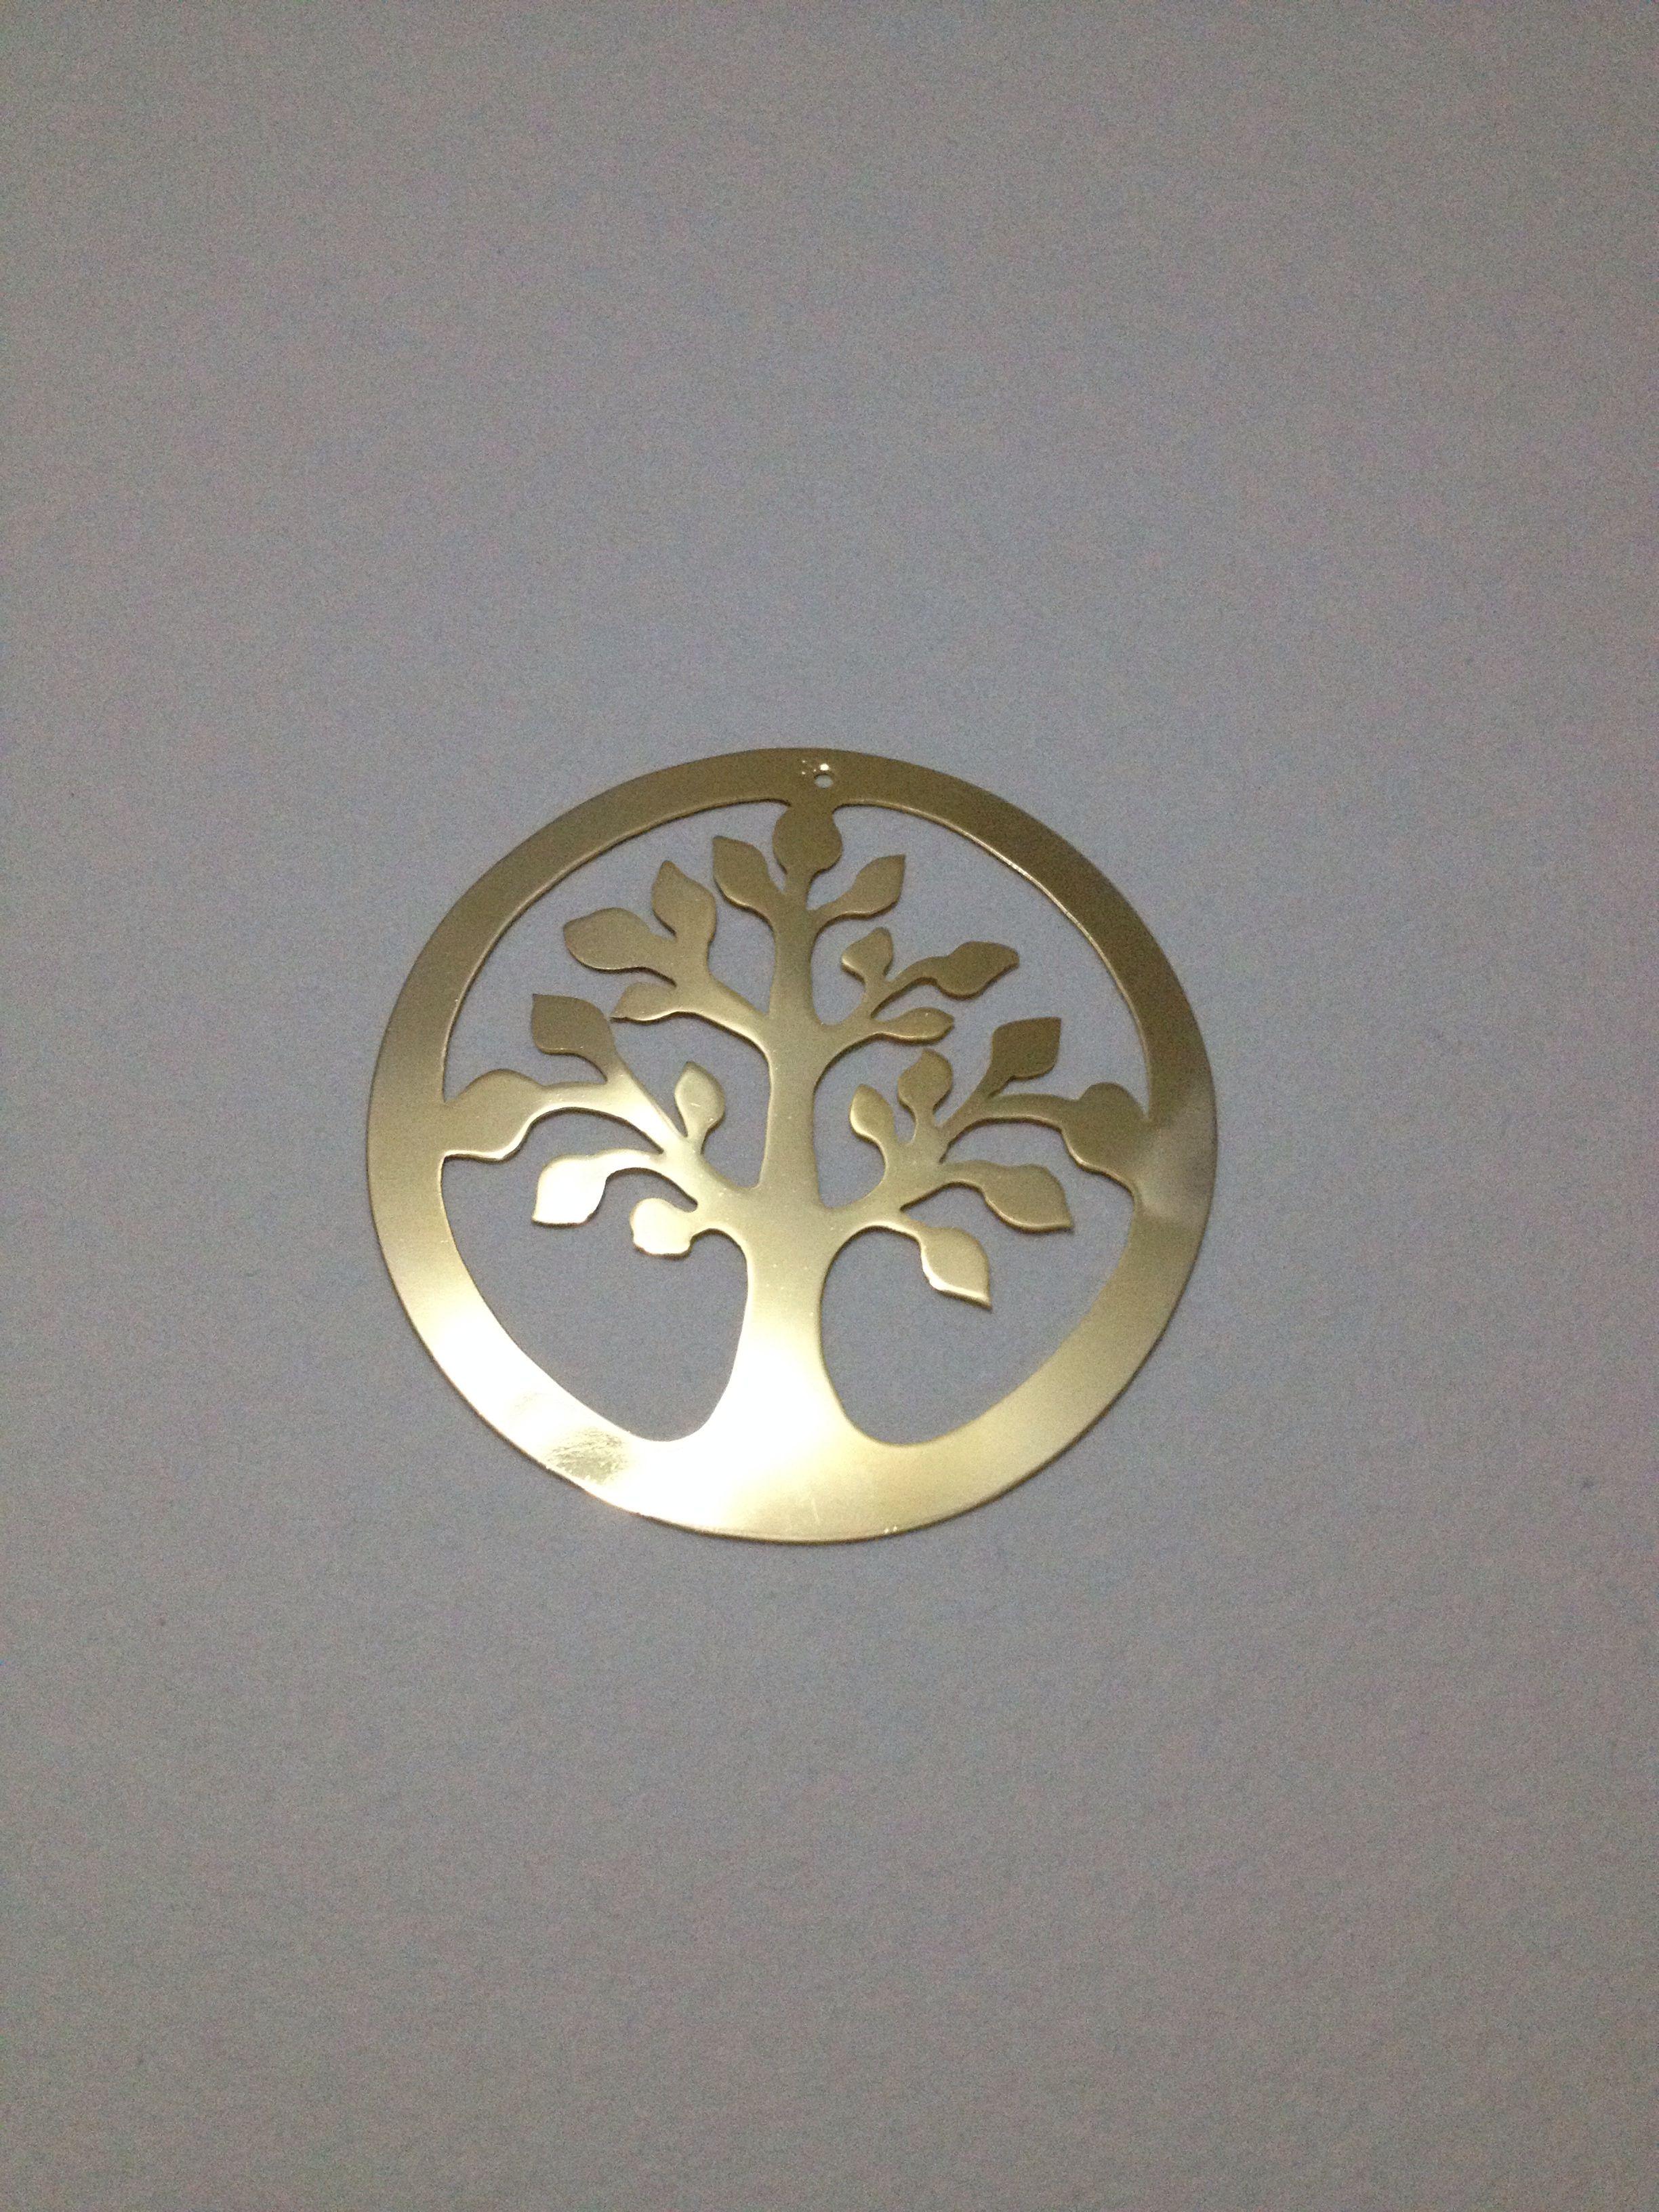 Dije calado de bronce con ba o de oro de 24k joyeria for Banos electroliticos para joyeria